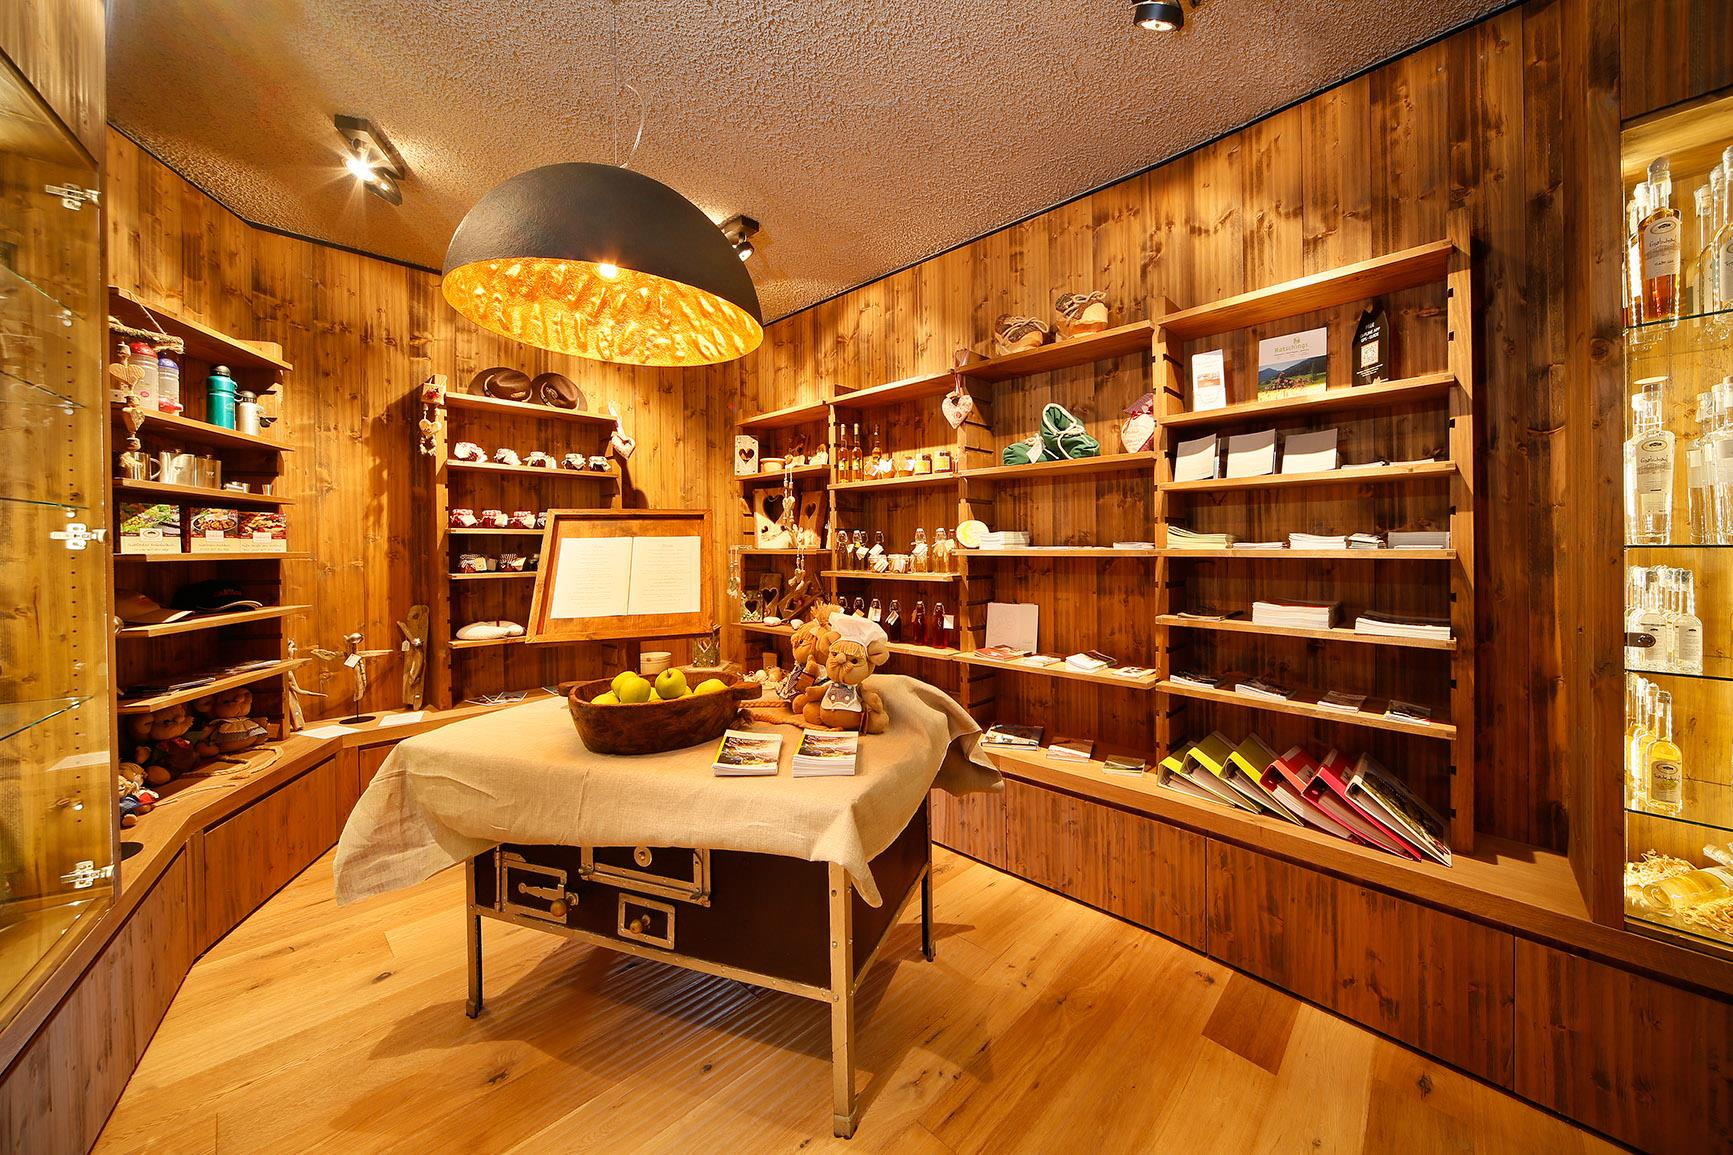 Gassenhof Shop